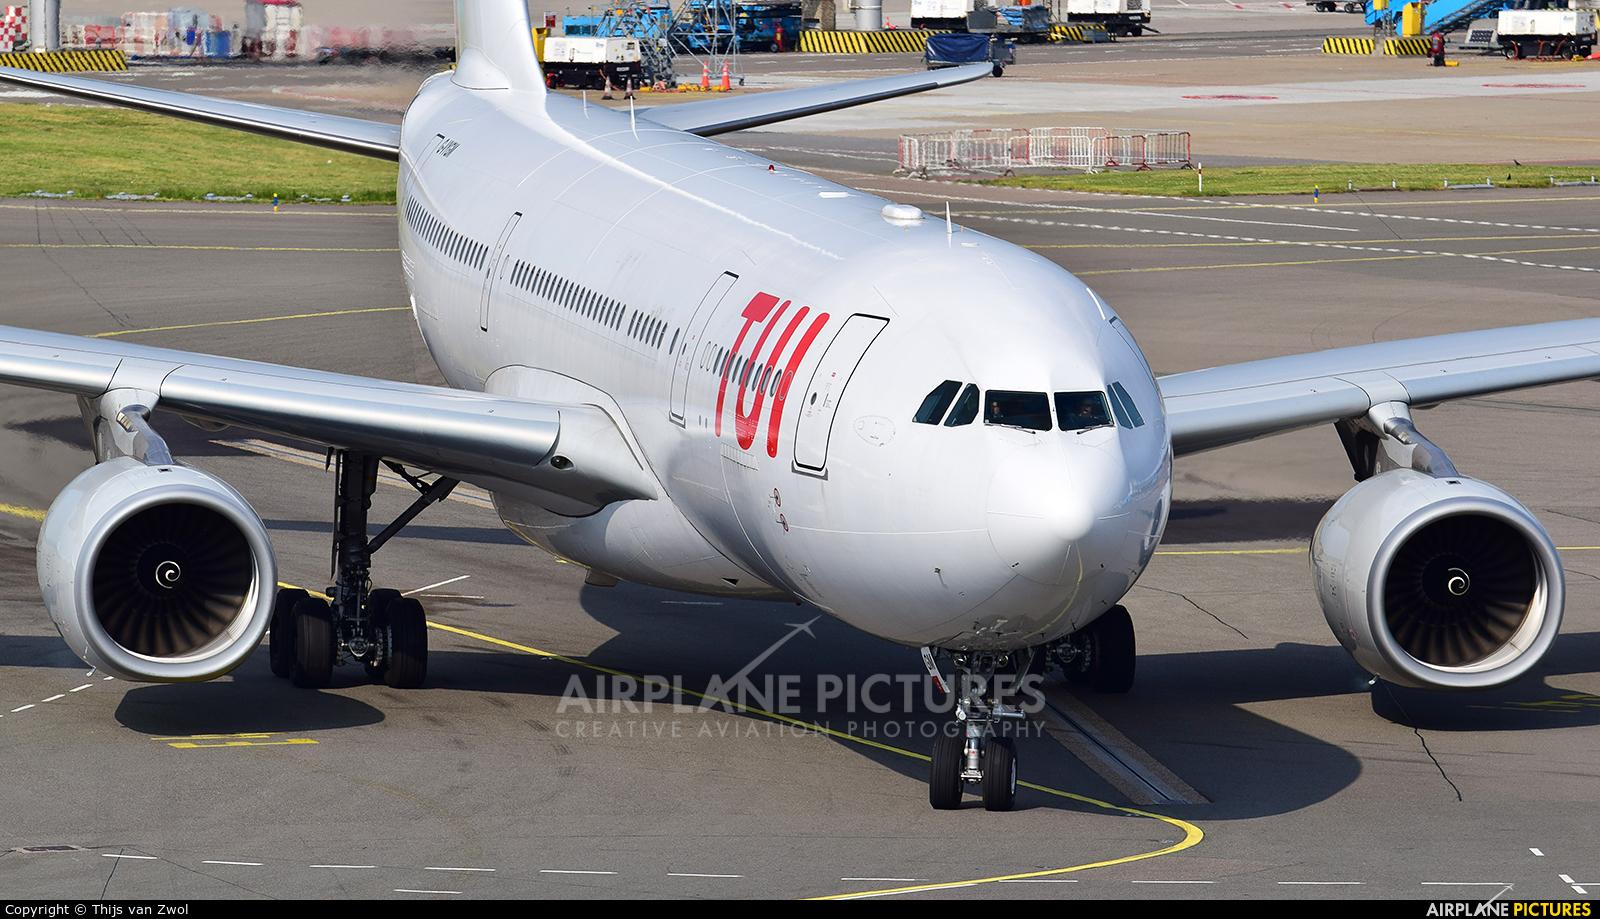 AirTanker Ltd G-VYGM aircraft at Amsterdam - Schiphol